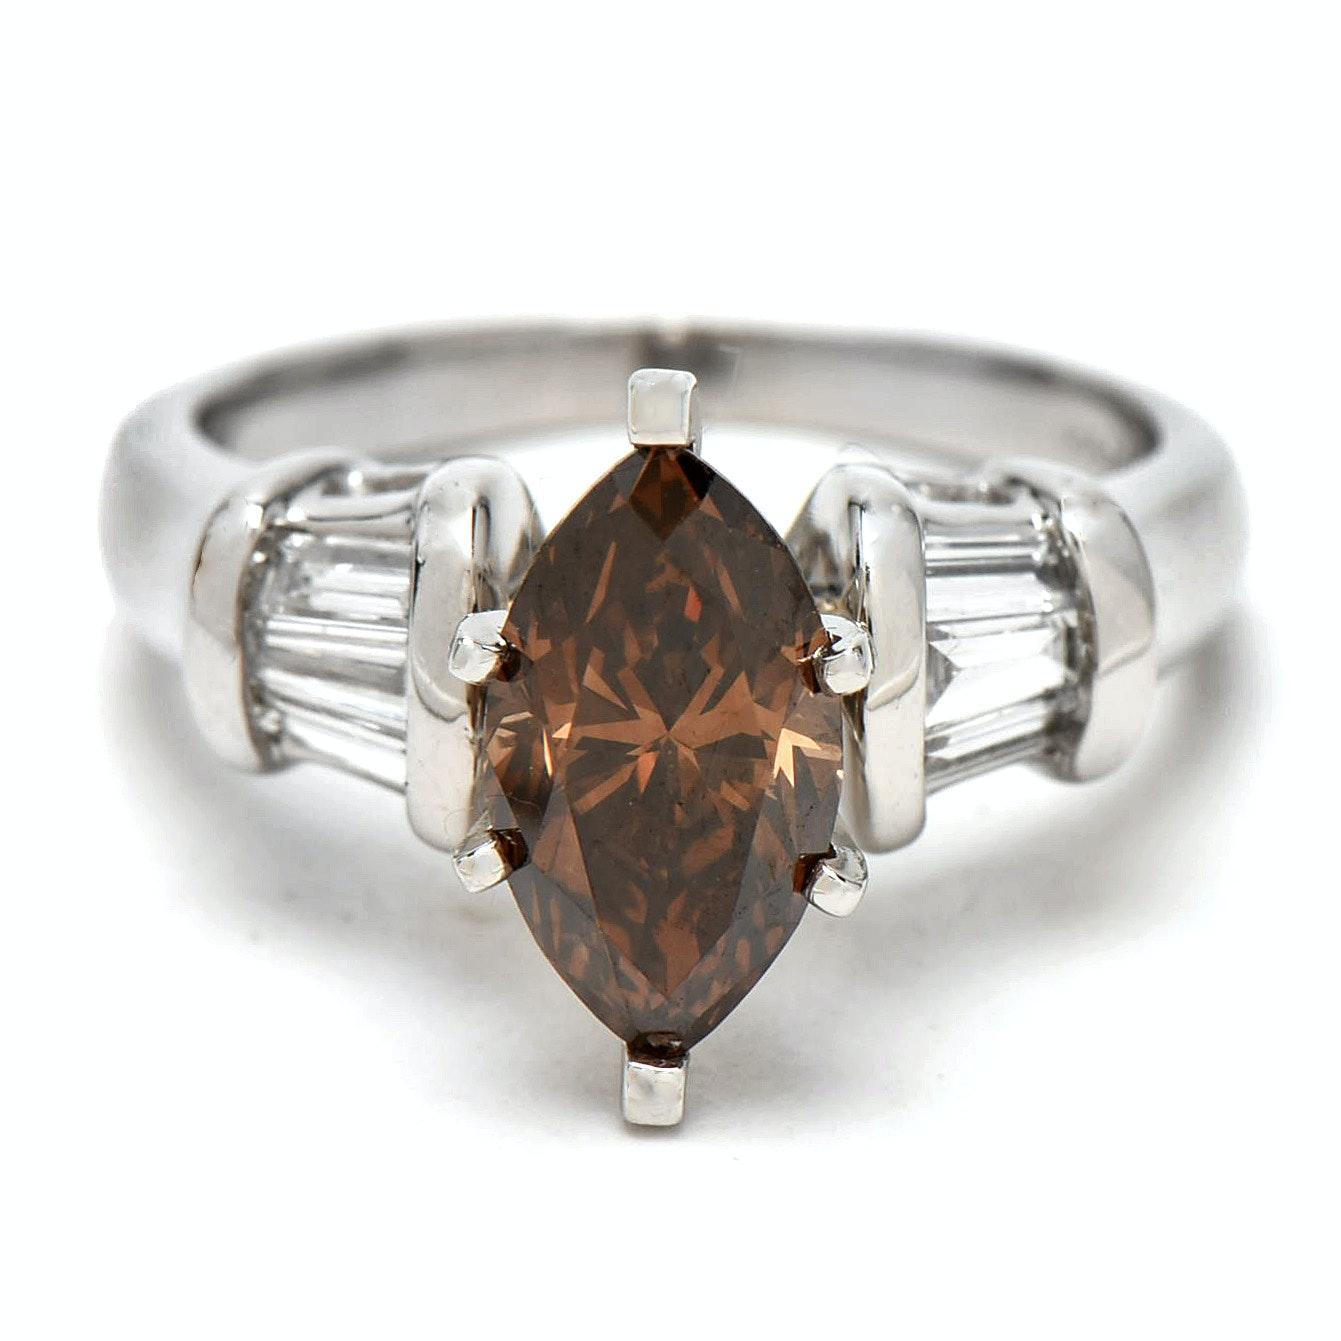 Platinum 1.57 CTW Diamond Engagement Ring with GIA Colored Diamond Report